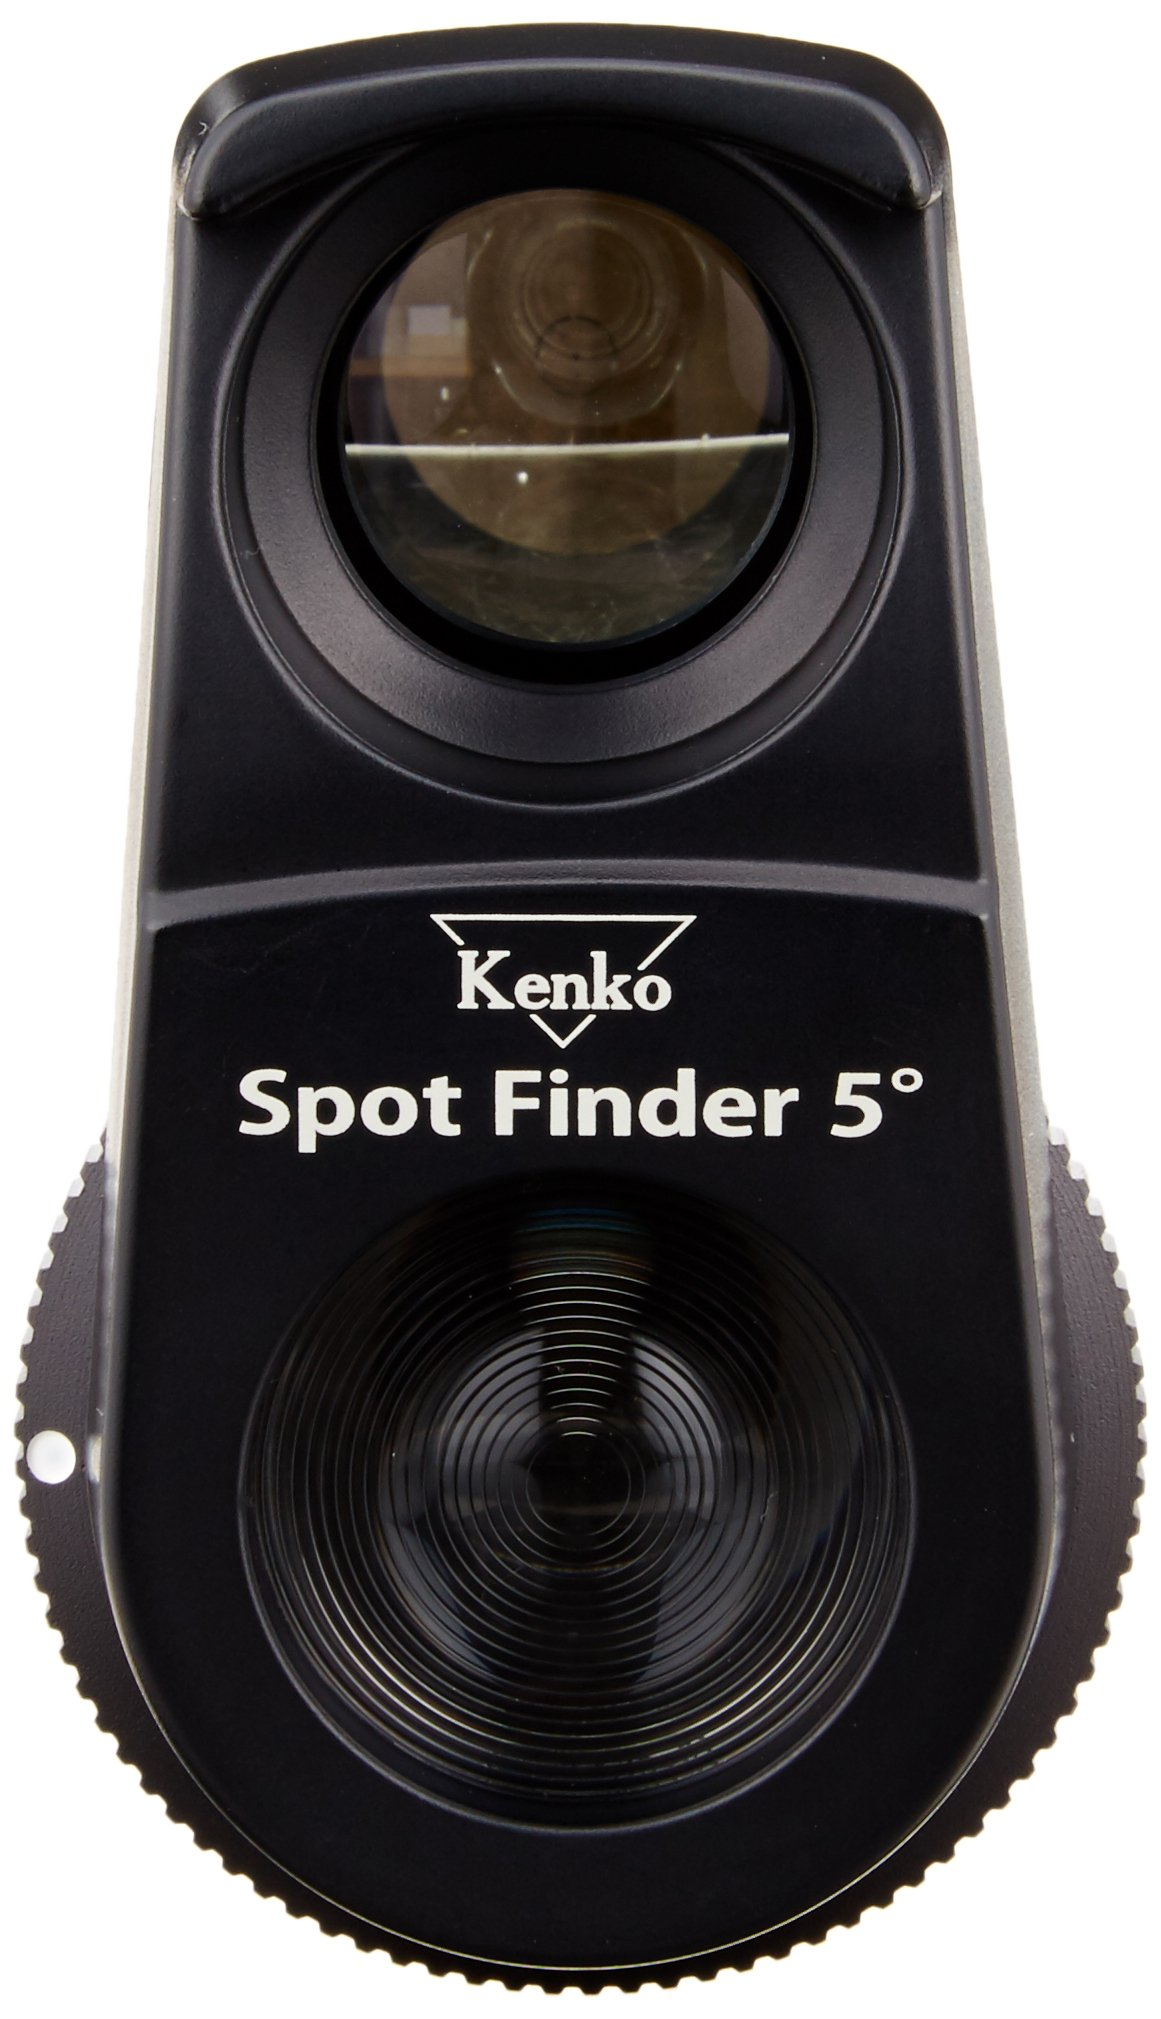 Kenko K-KFM-100 5 Degree Spotfinder for KFM-1100 by Ken Telloian Music